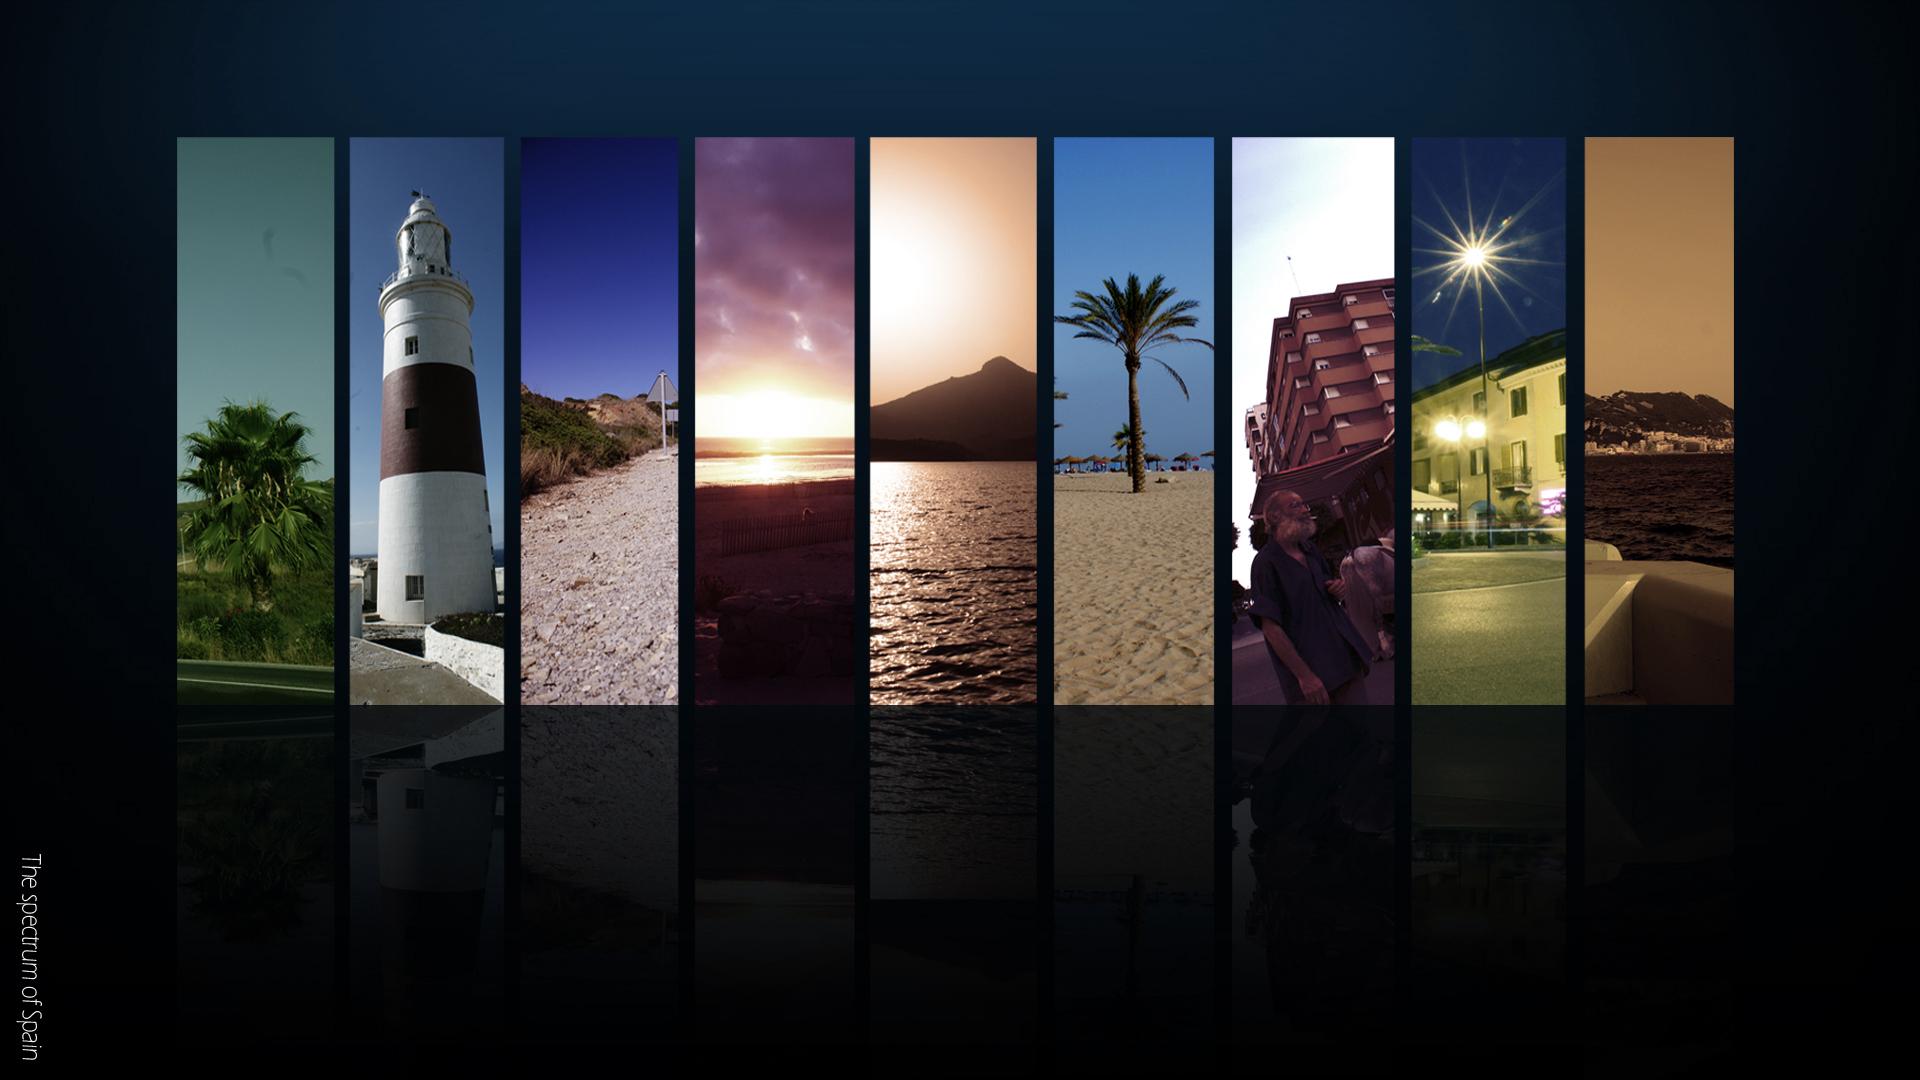 The spectrum of Spain